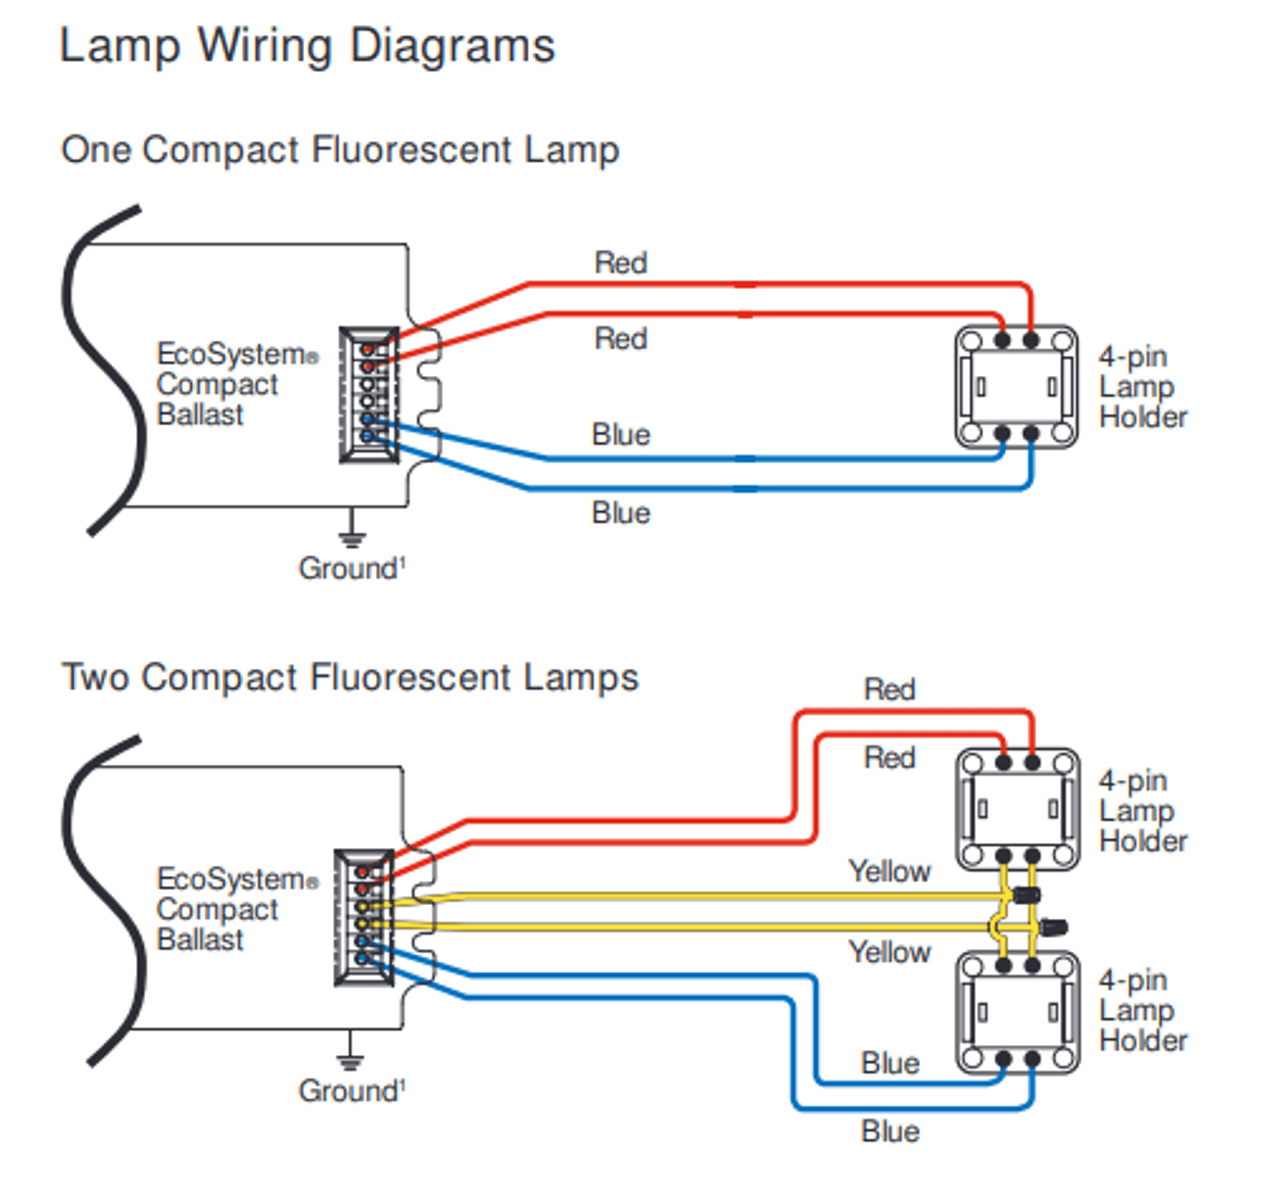 medium resolution of ec3dt4mwku1s lutron electronic fluorescent dimming ballastec3dt4mwku1s lutron ec3dt4mwku1s dimensions ec3dt4mwku1s wiring diagram